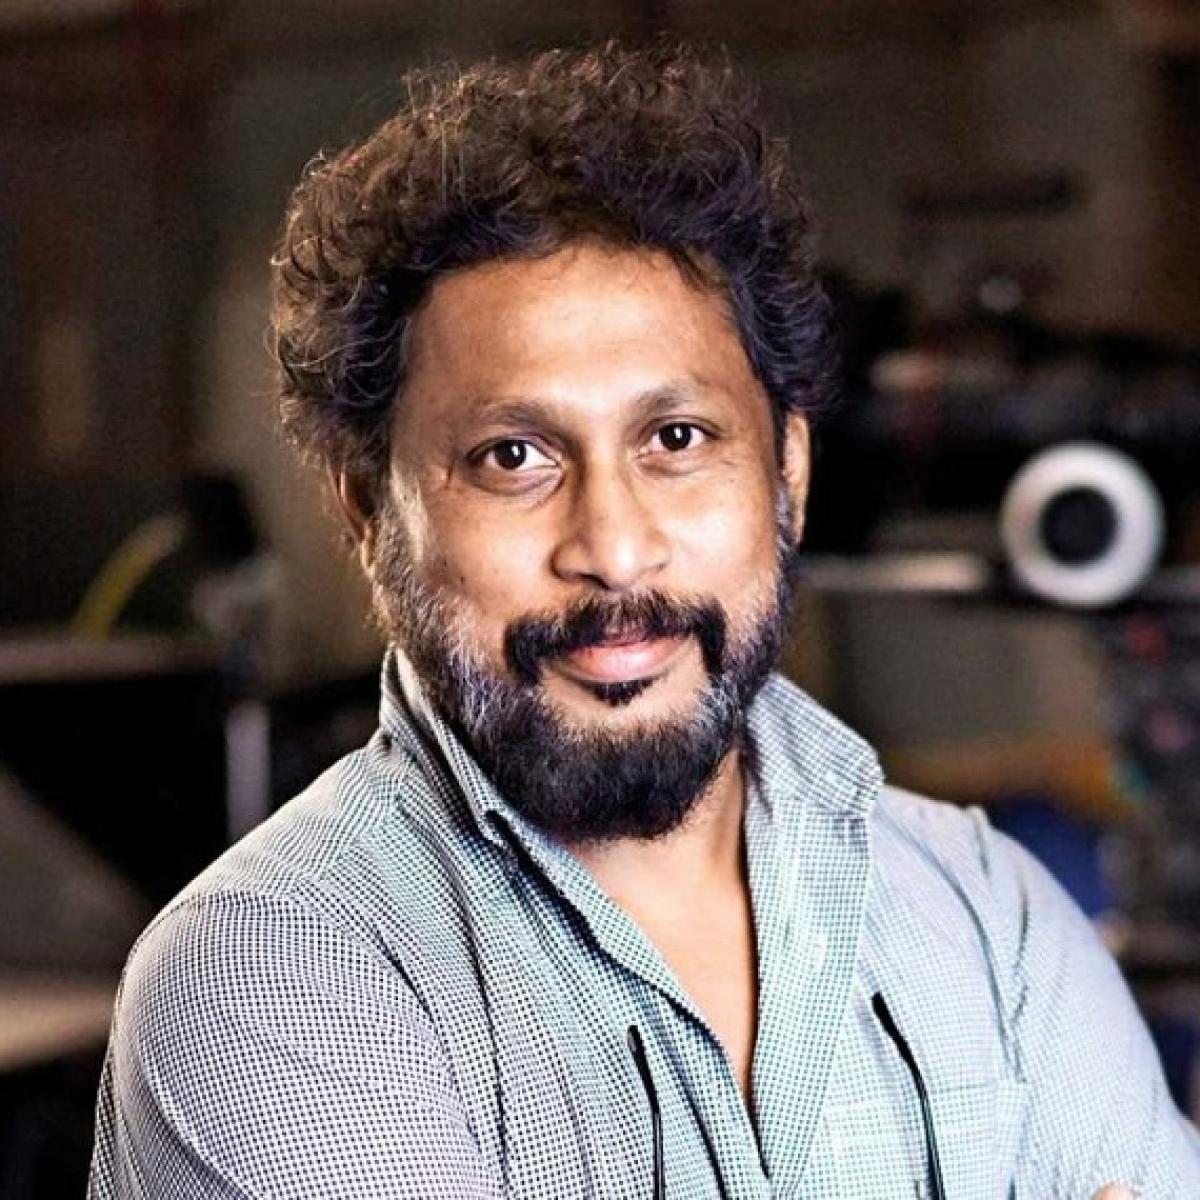 'I want to make my version of the Mahabharat for OTT,' says filmmaker Shoojit Sircar